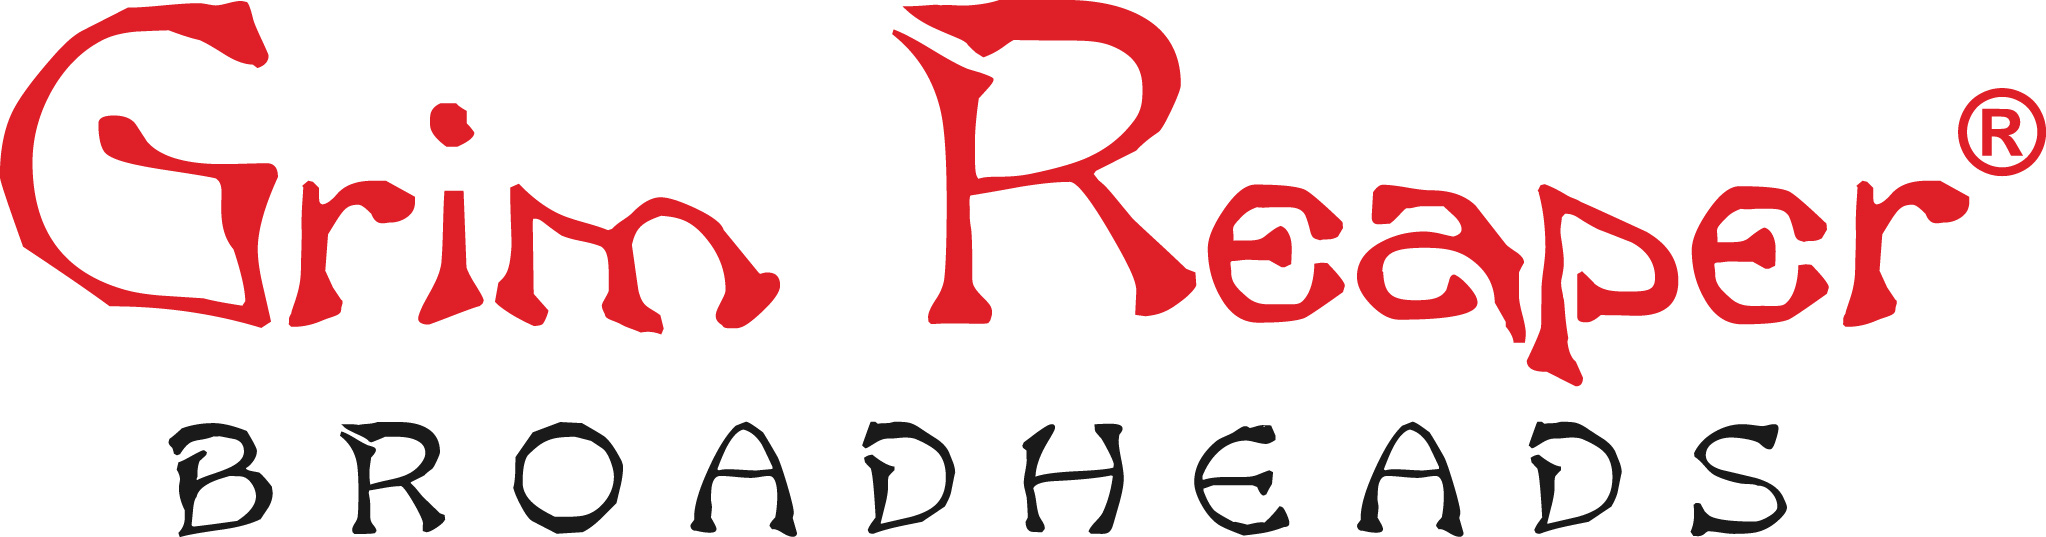 grim reaper archery logo